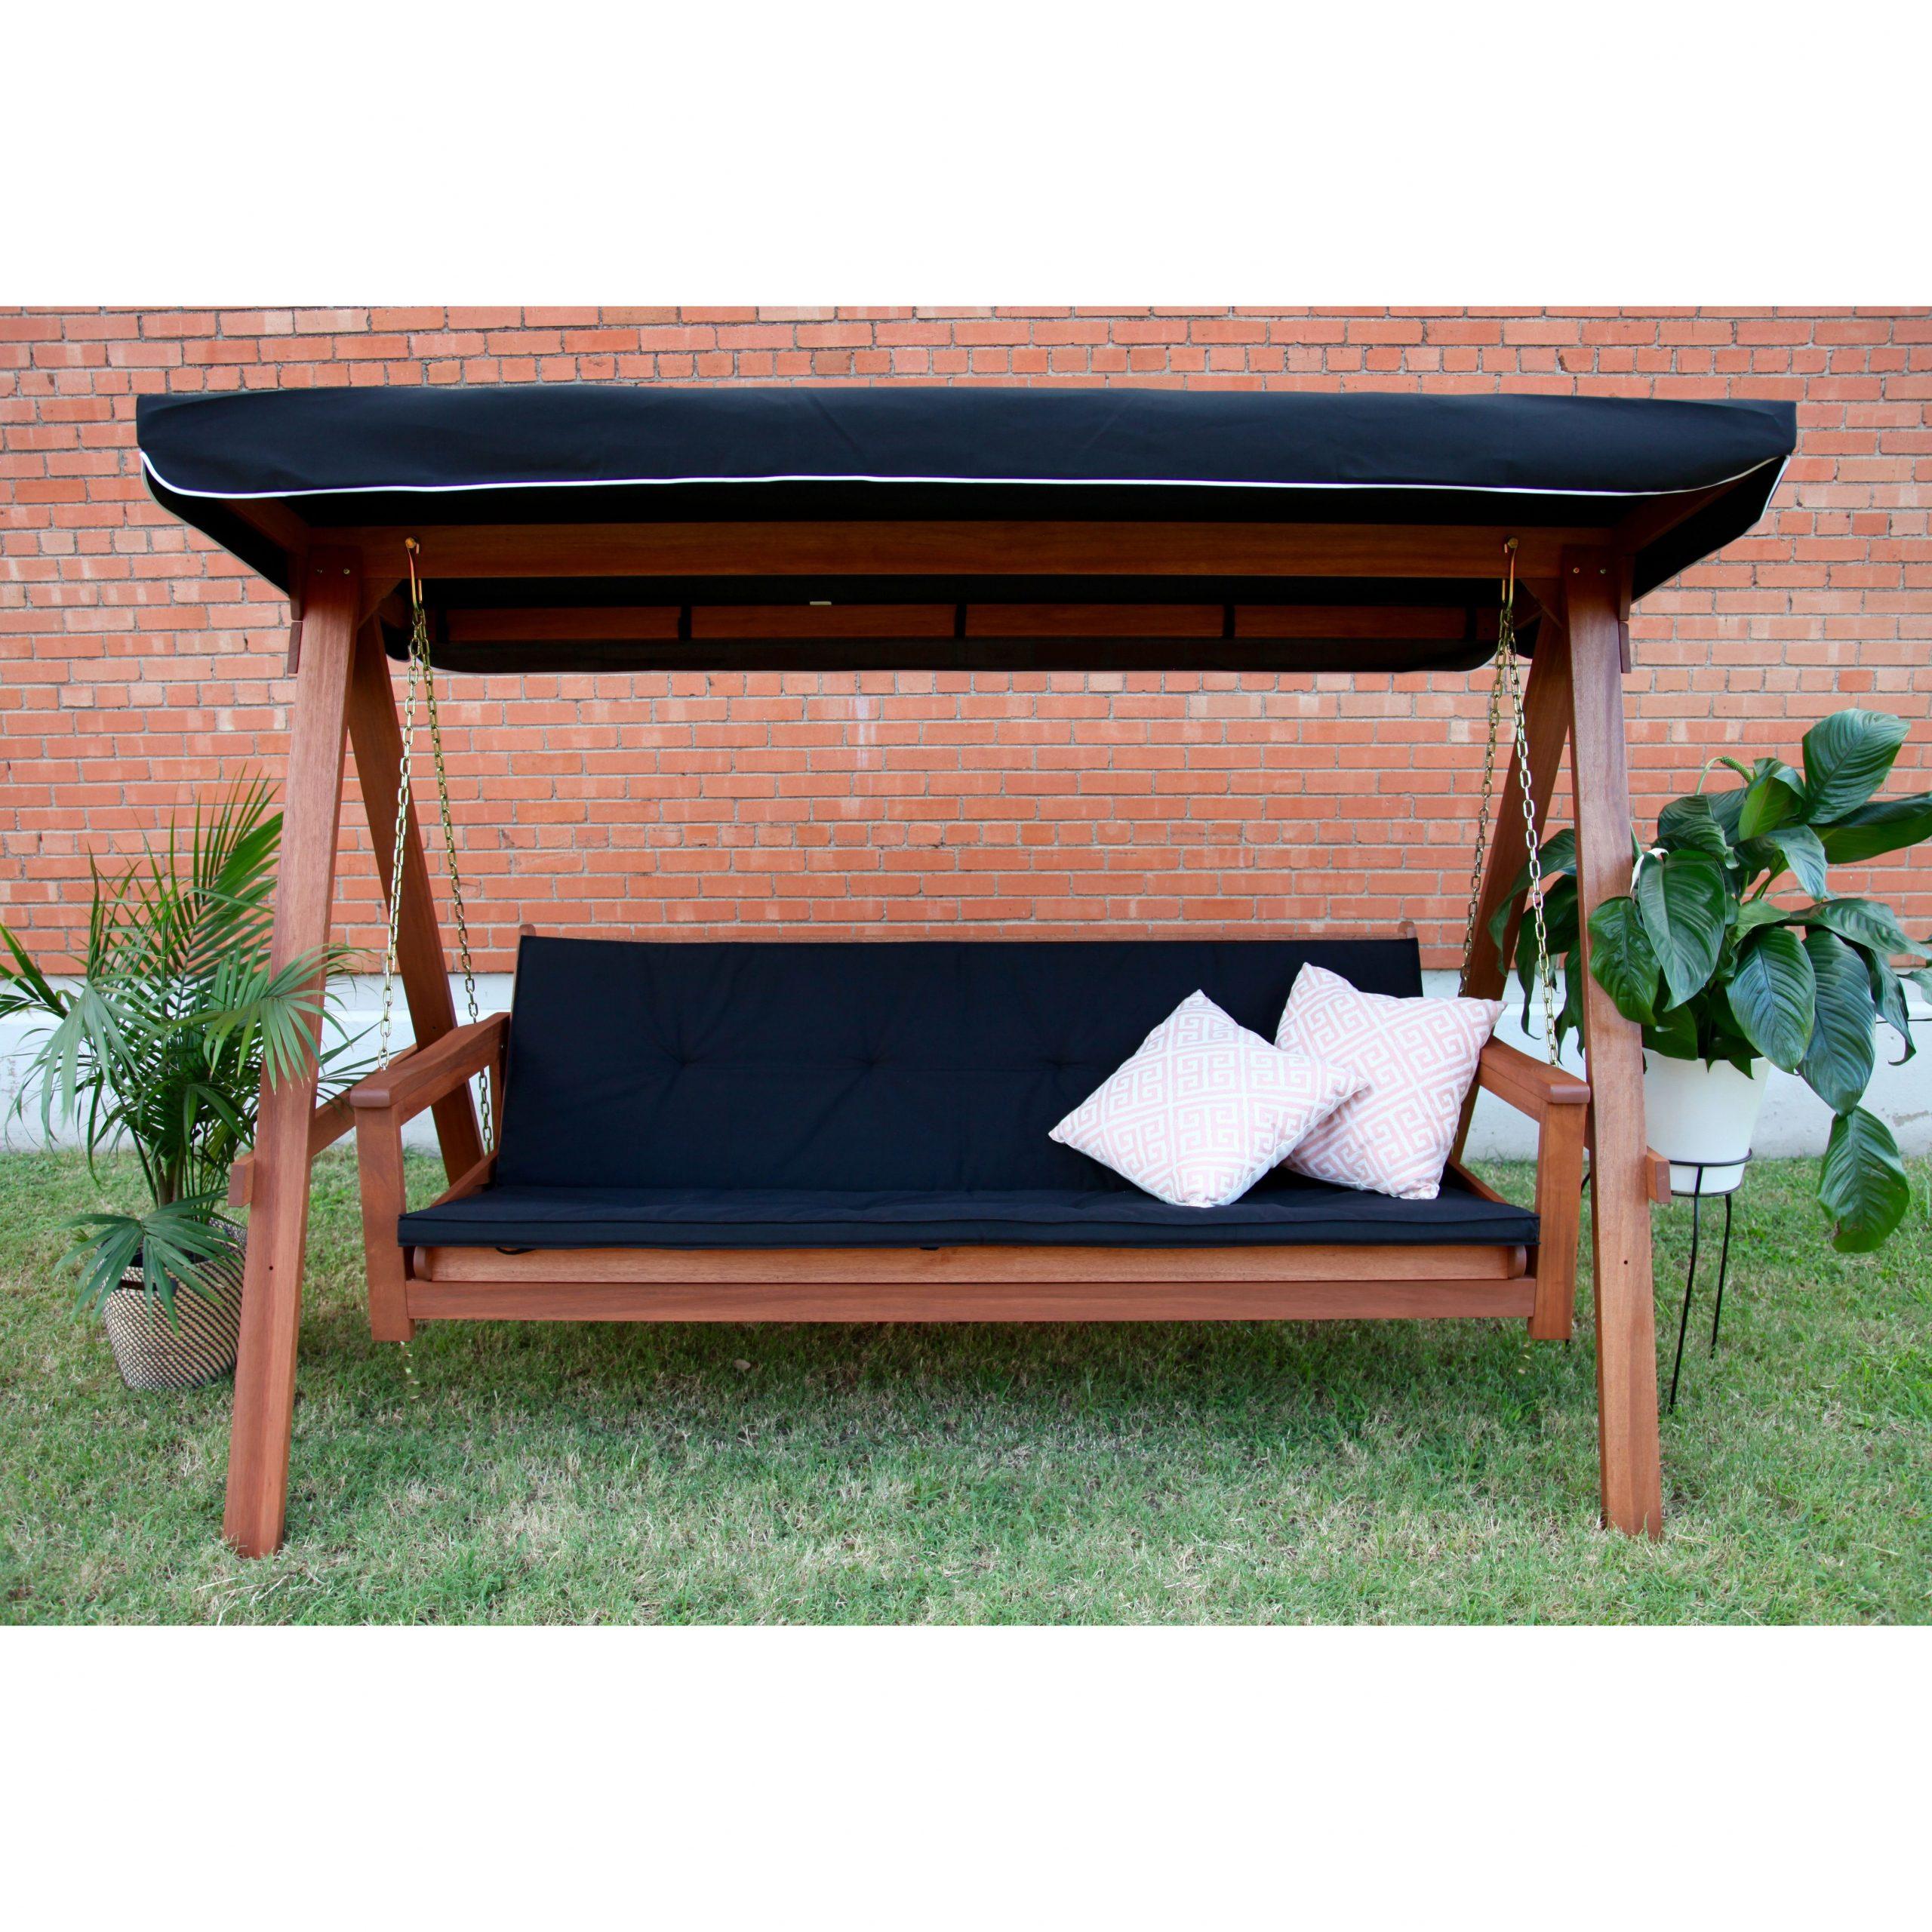 Lautan Llc Avoca 3 Seat Porch Swing Daybed | Porch Swing With Daybed Porch Swings With Stand (View 2 of 25)